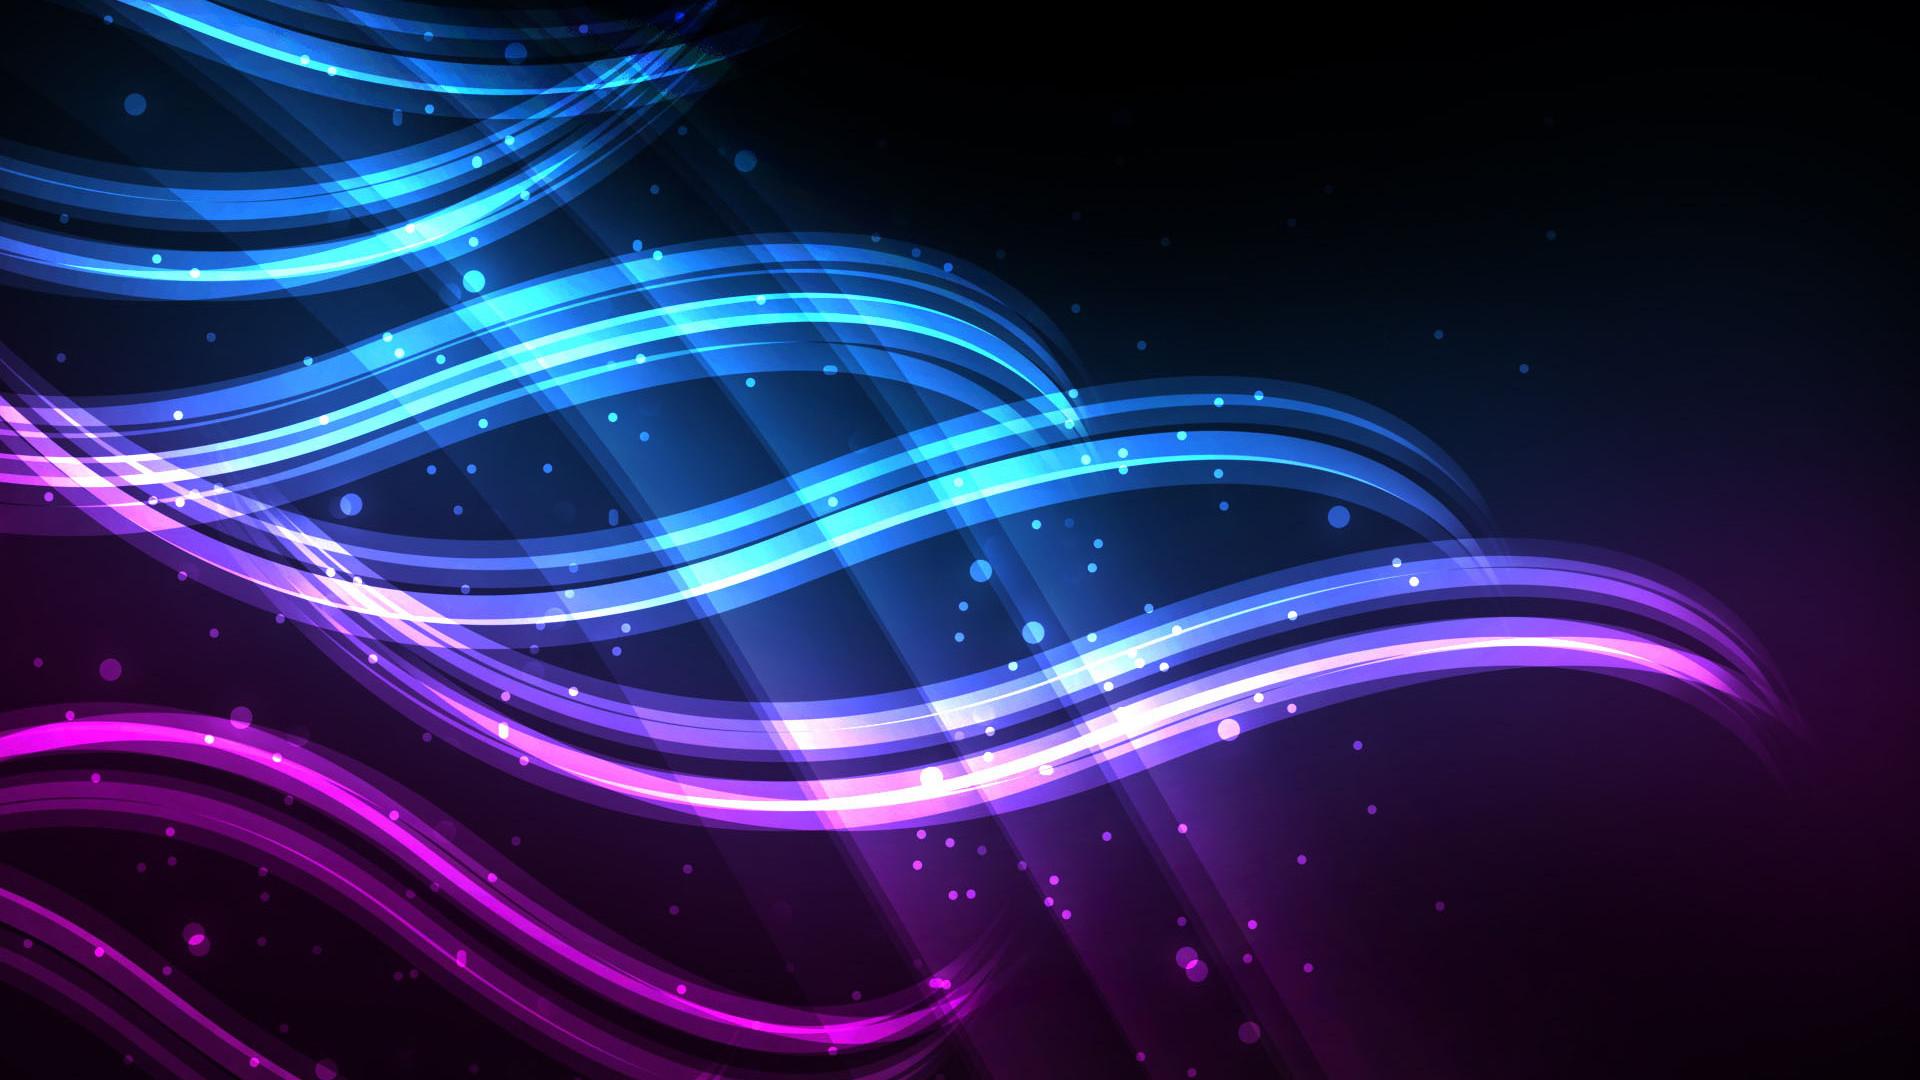 Shades of Blue -1080p HD Wallpaper